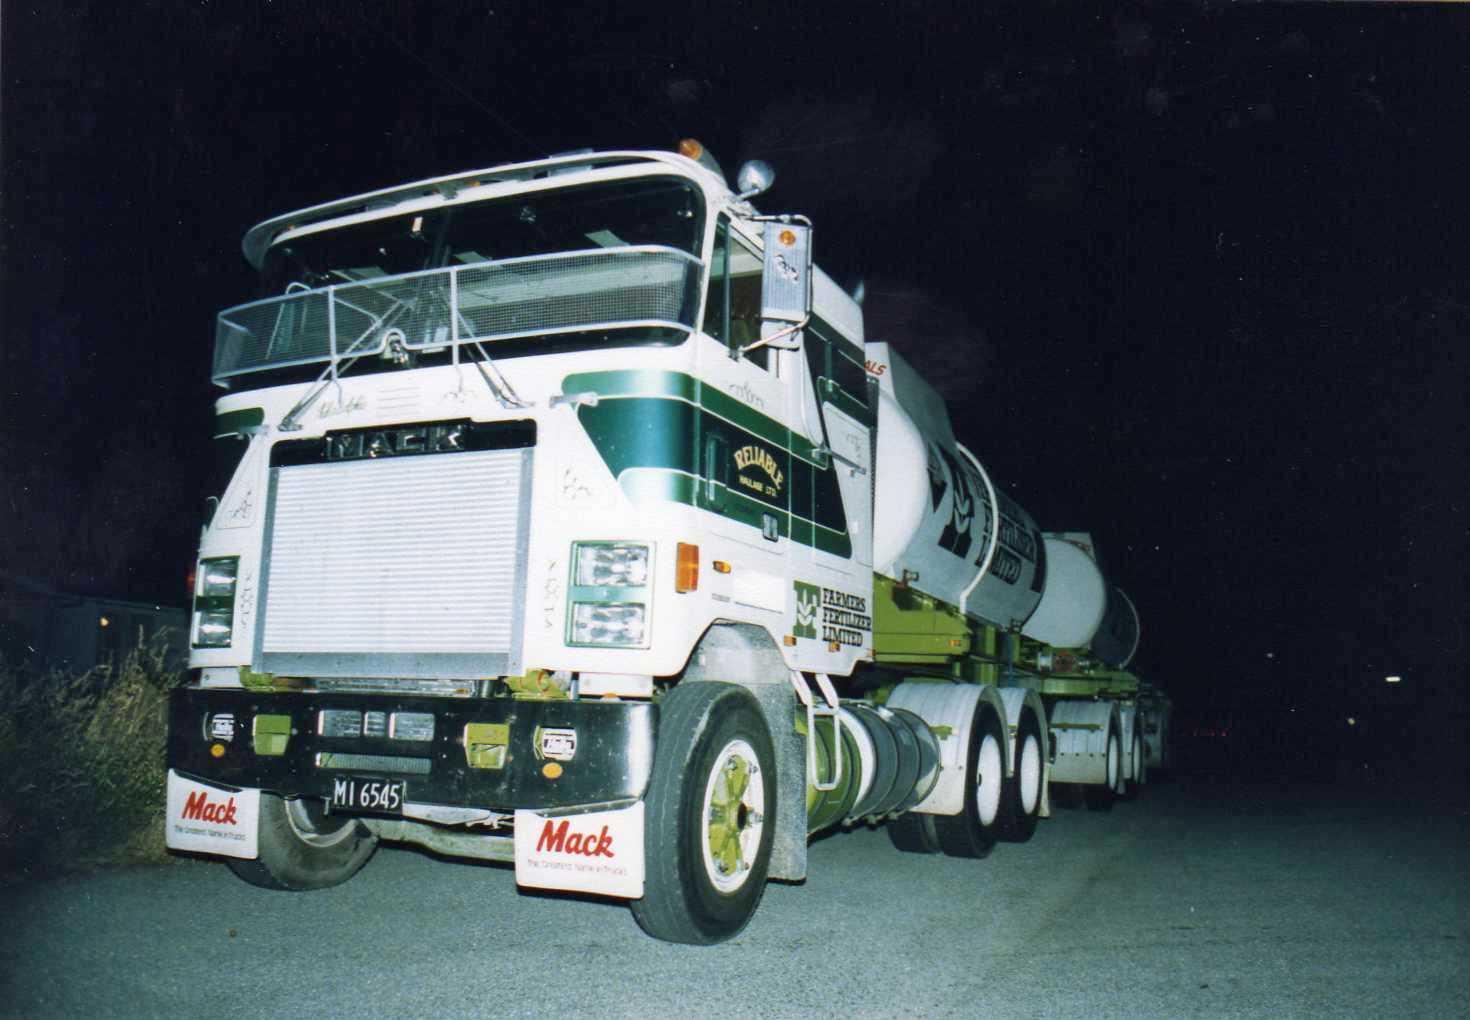 Mack Truck Fertilizer : The road ranger tankers